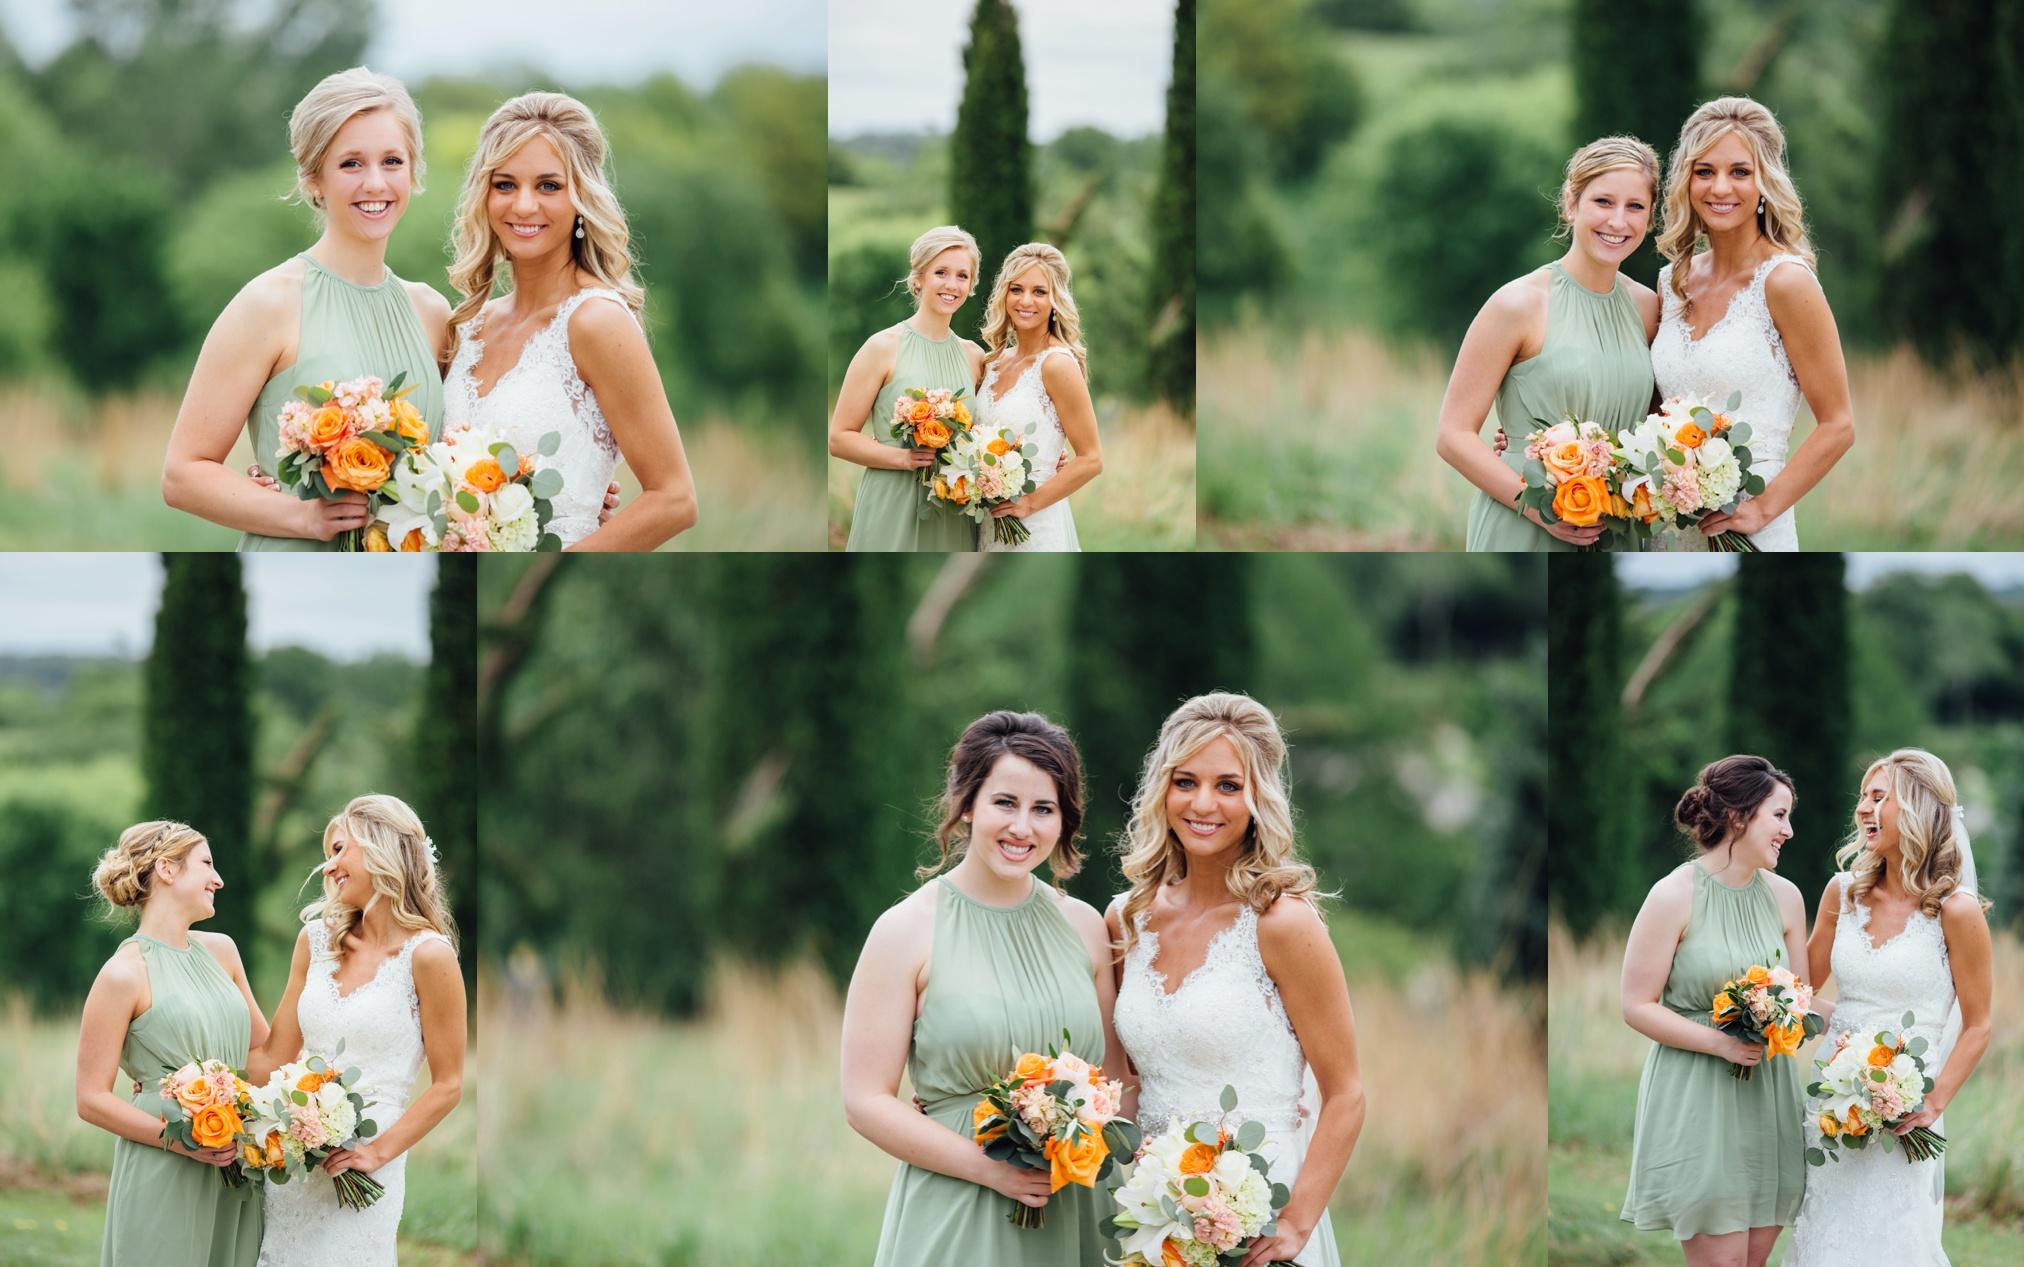 schmid_wedding-145.jpg